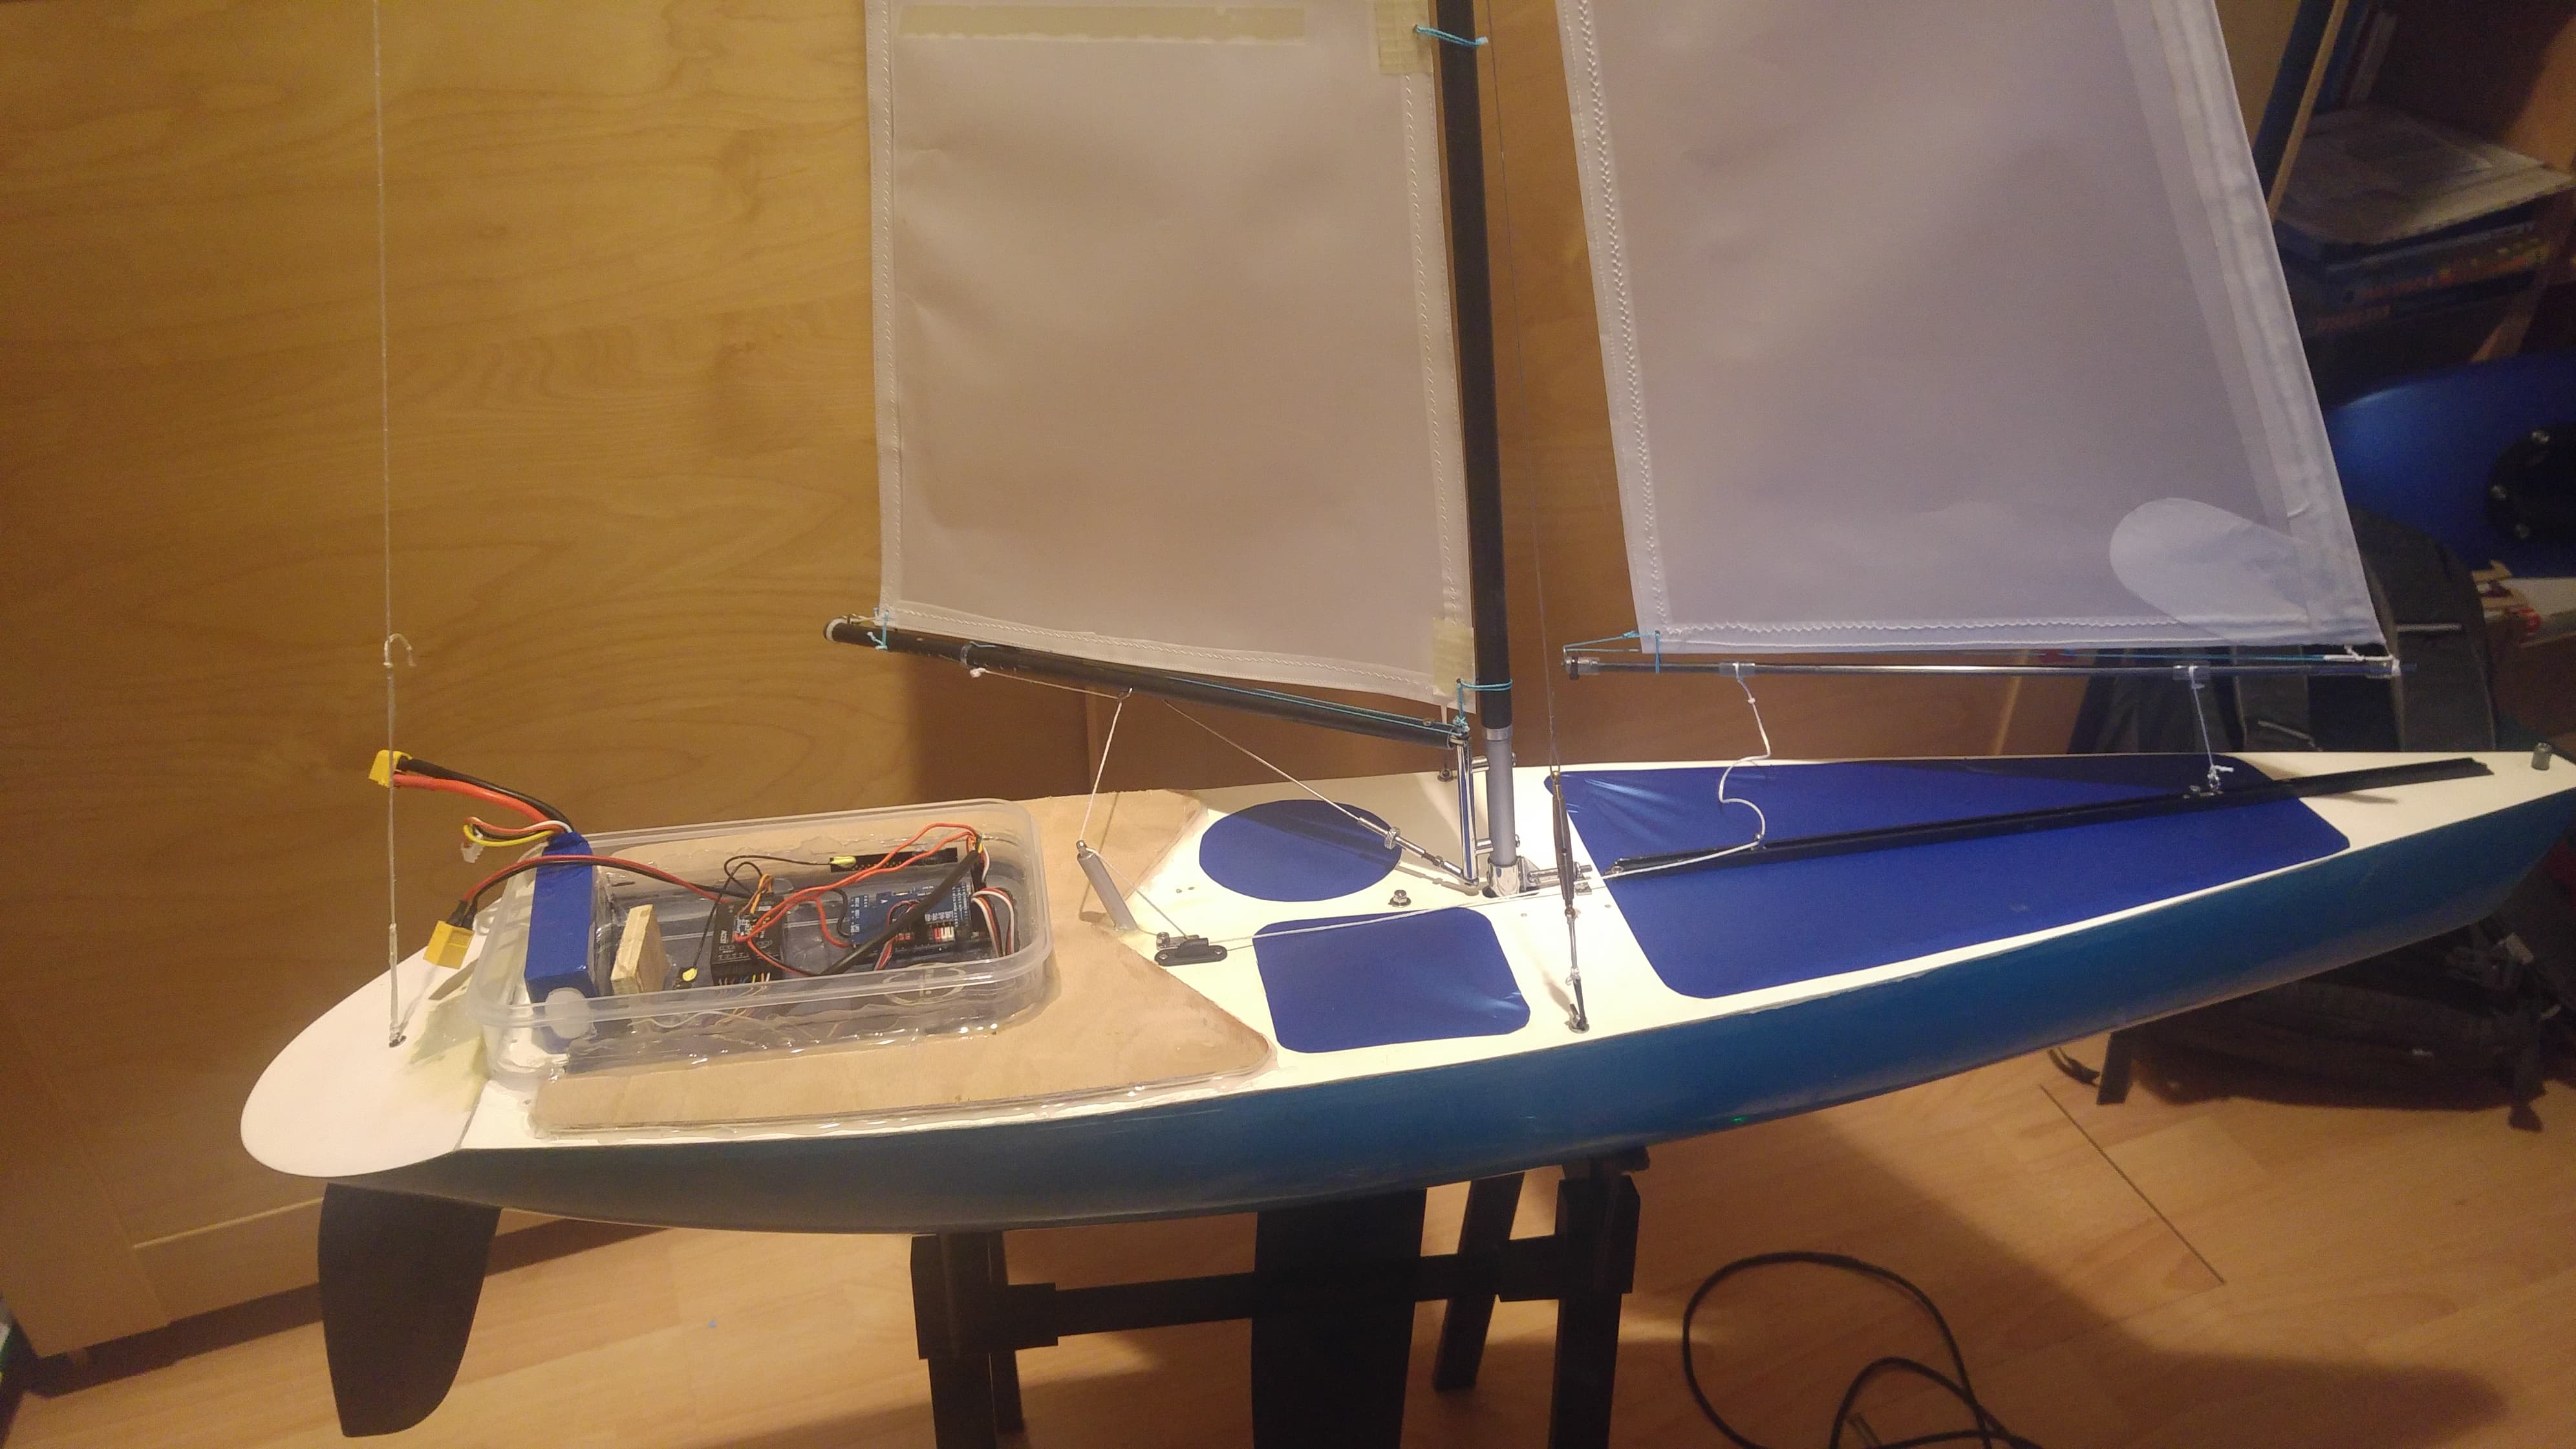 Sailboat Support - ArduBoat - ArduPilot Discourse